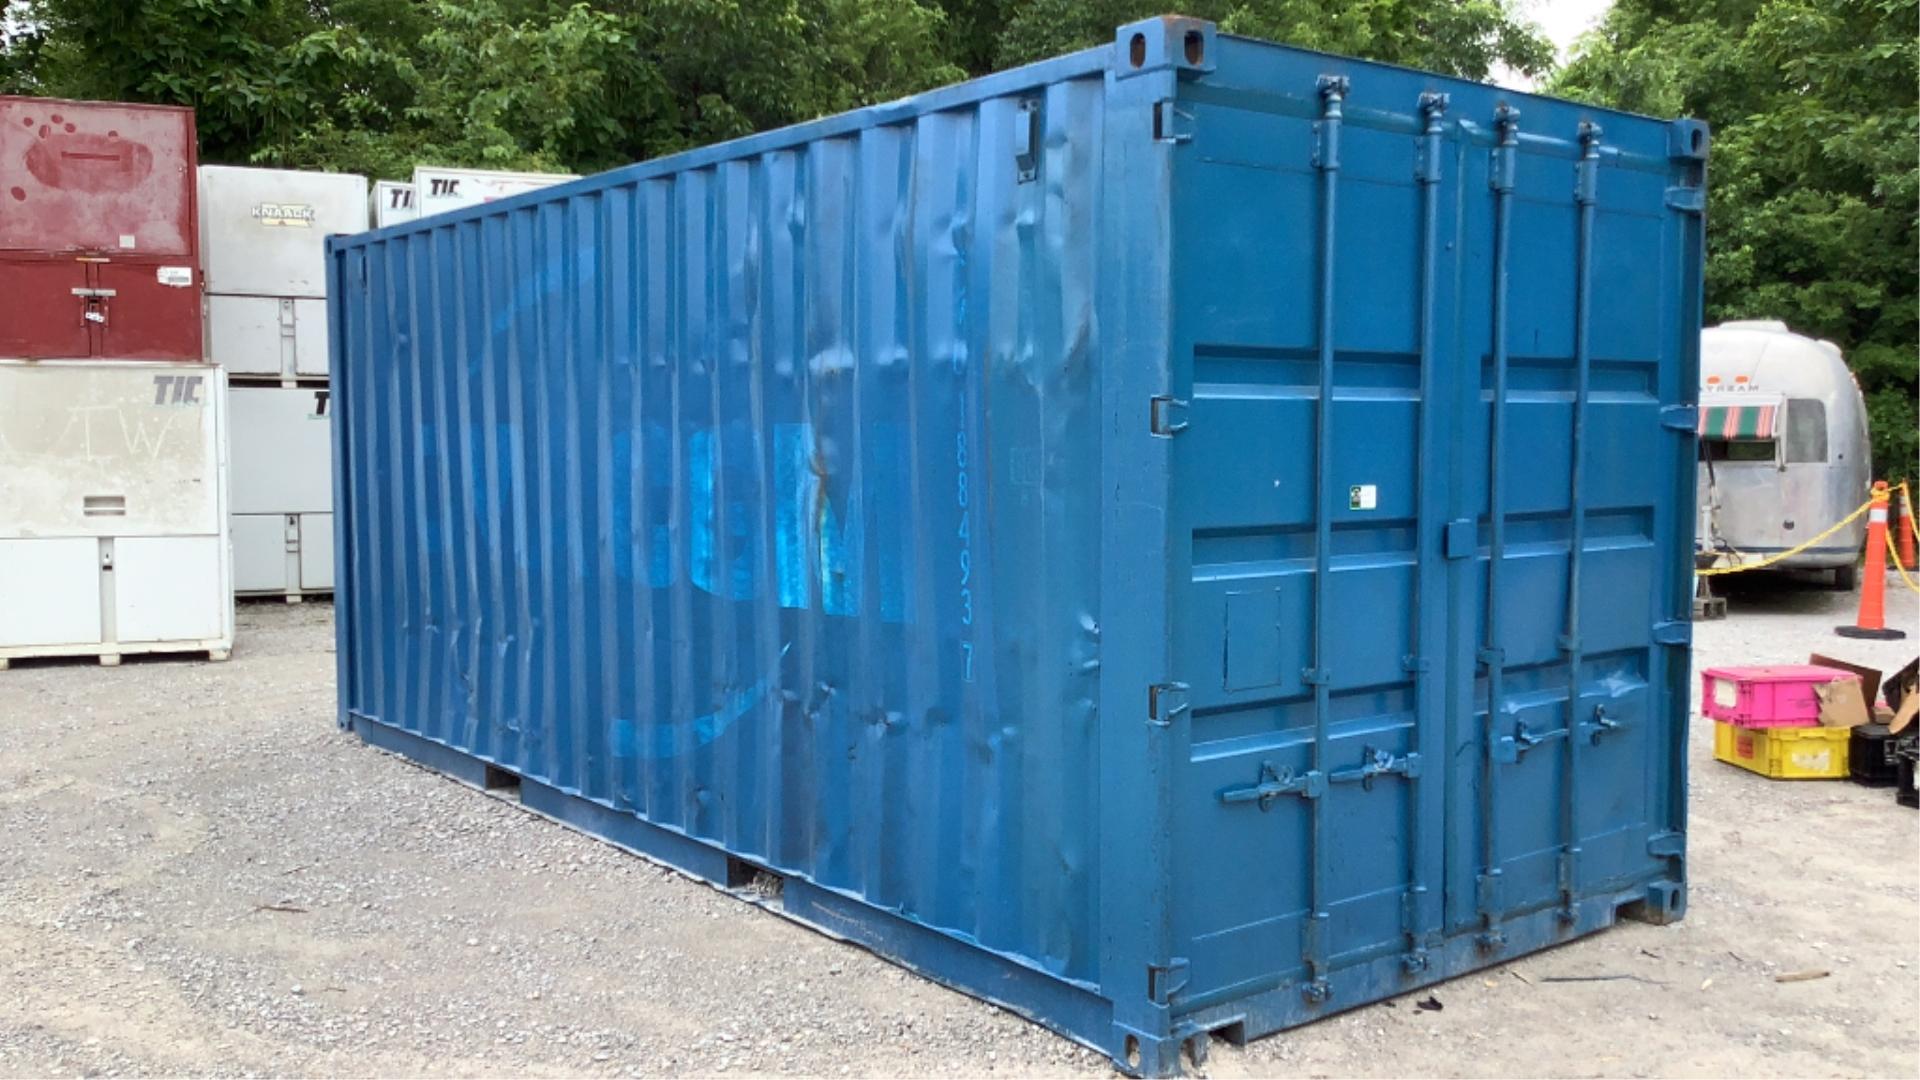 20' CIMC Shipping Container